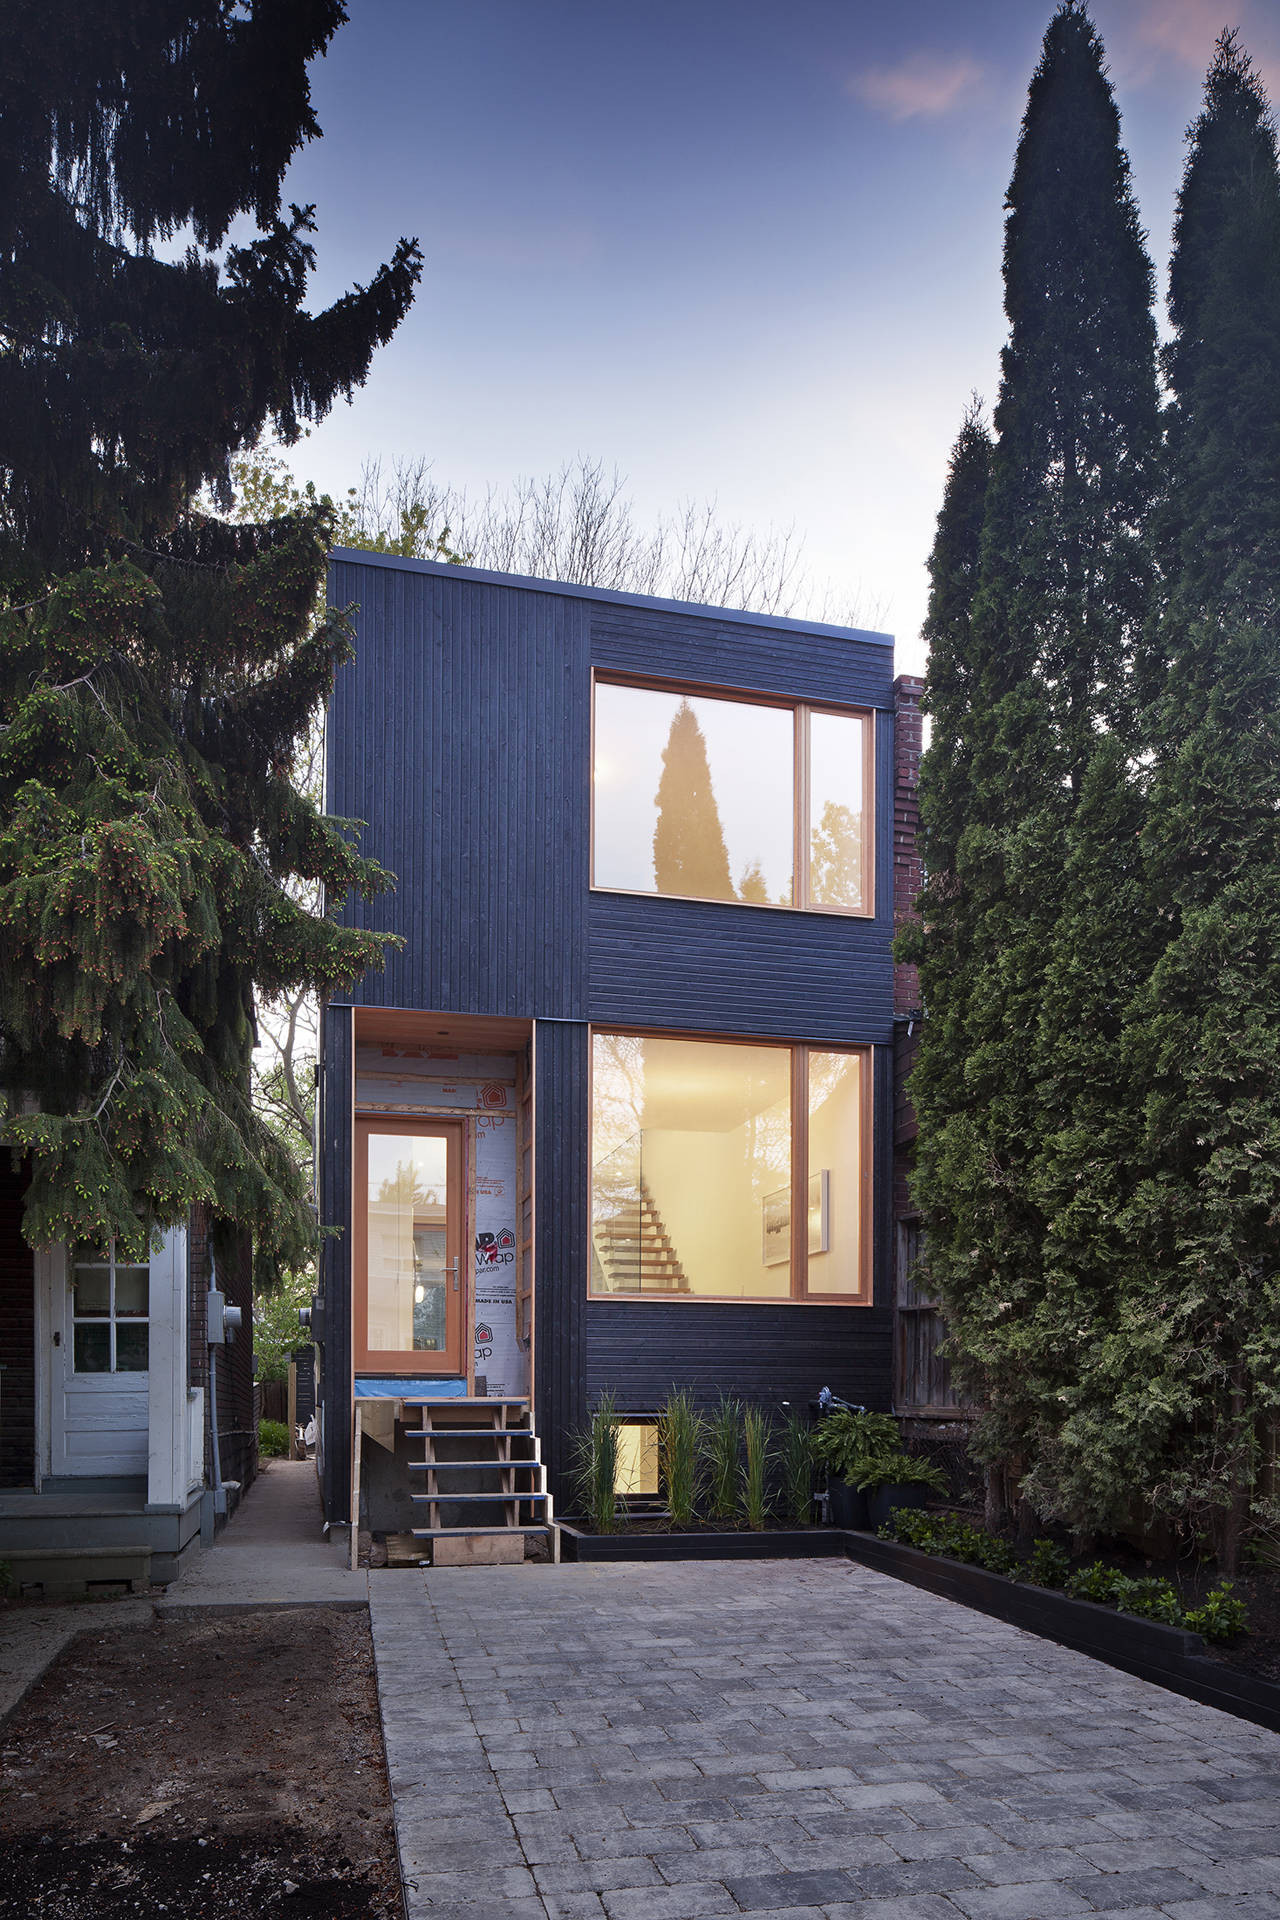 House 1 / Kyra Clarkson Architect, © Steven Evans Photography